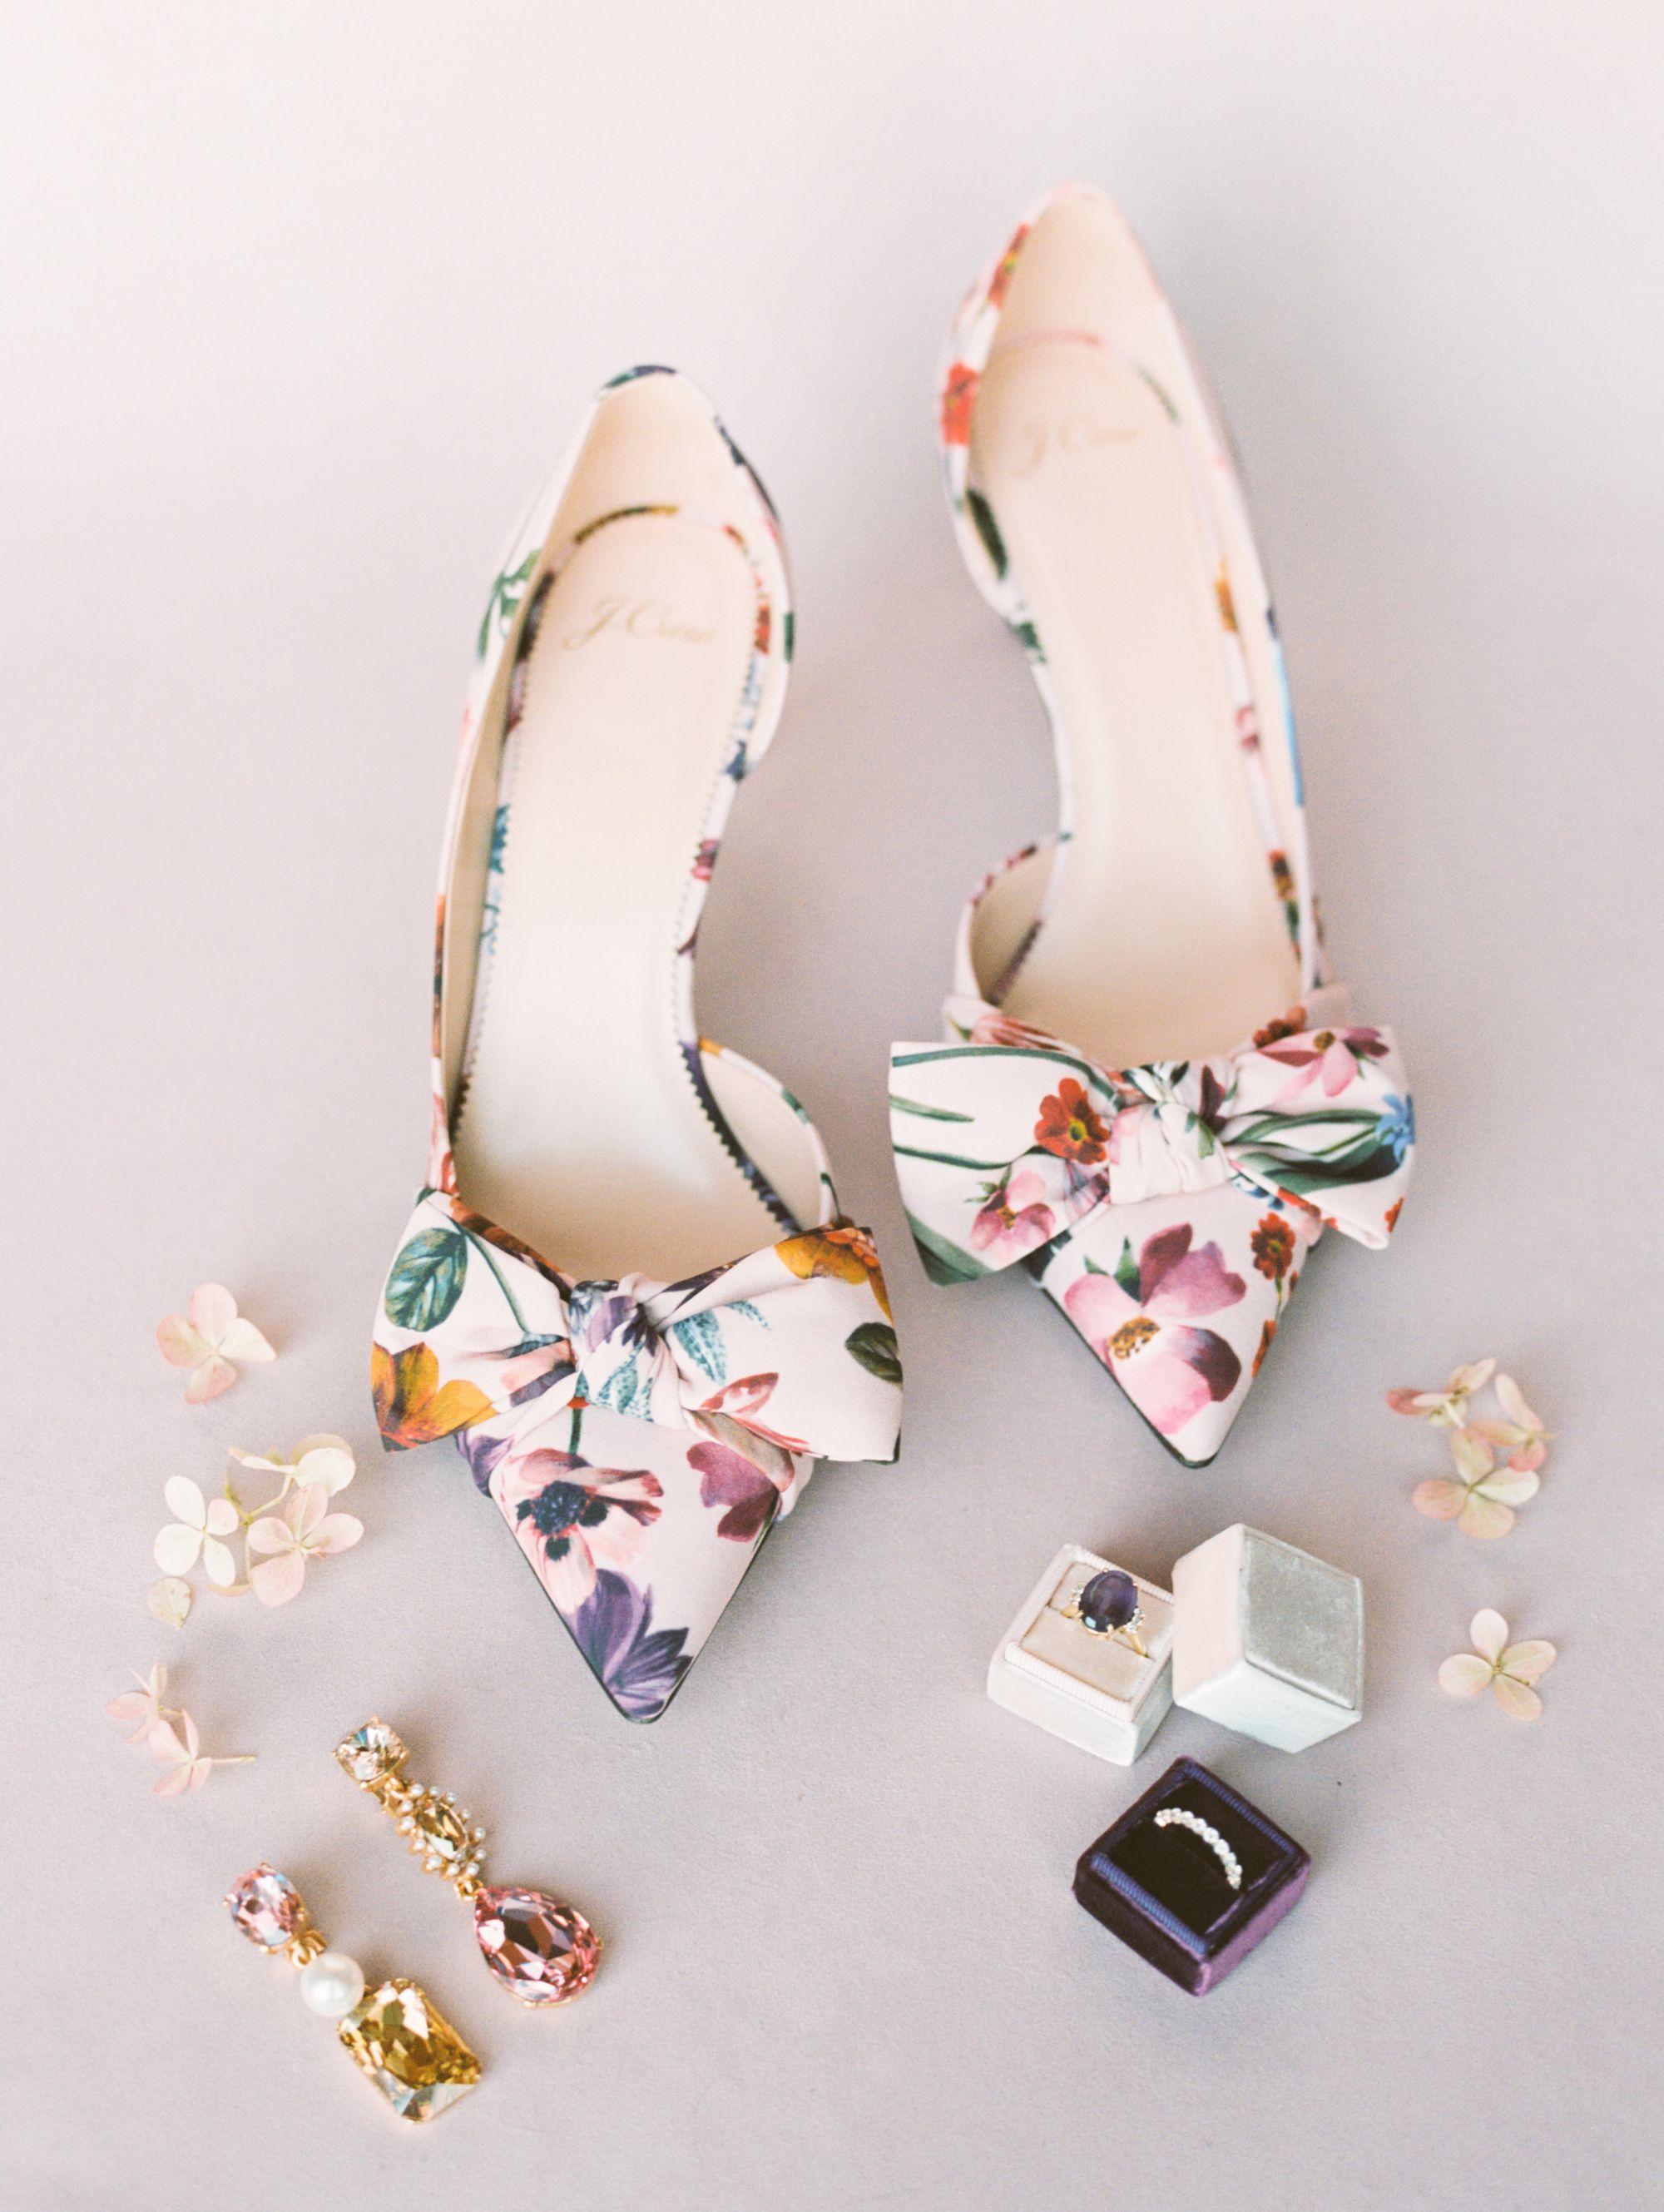 Colorful Floral Wedding Shoes For Bride Floral Wedding Shoe Wedding Shoes Bride Shoes